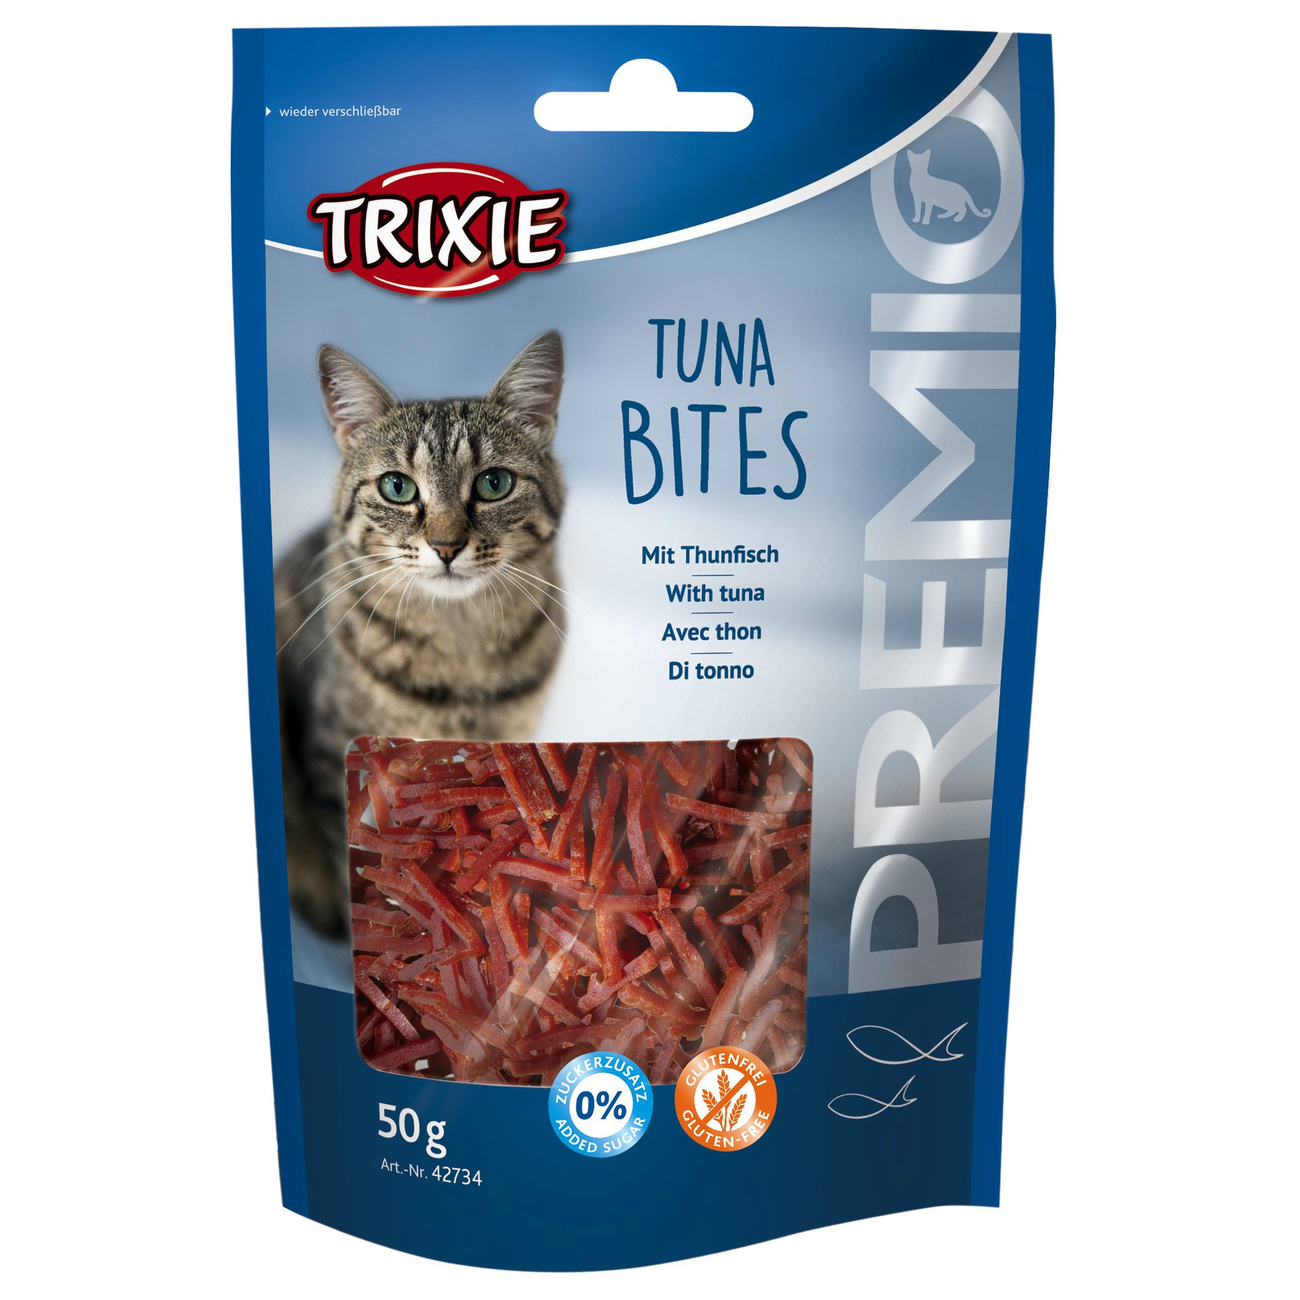 Trixie PREMIO Tuna Bites Katzenleckerlis